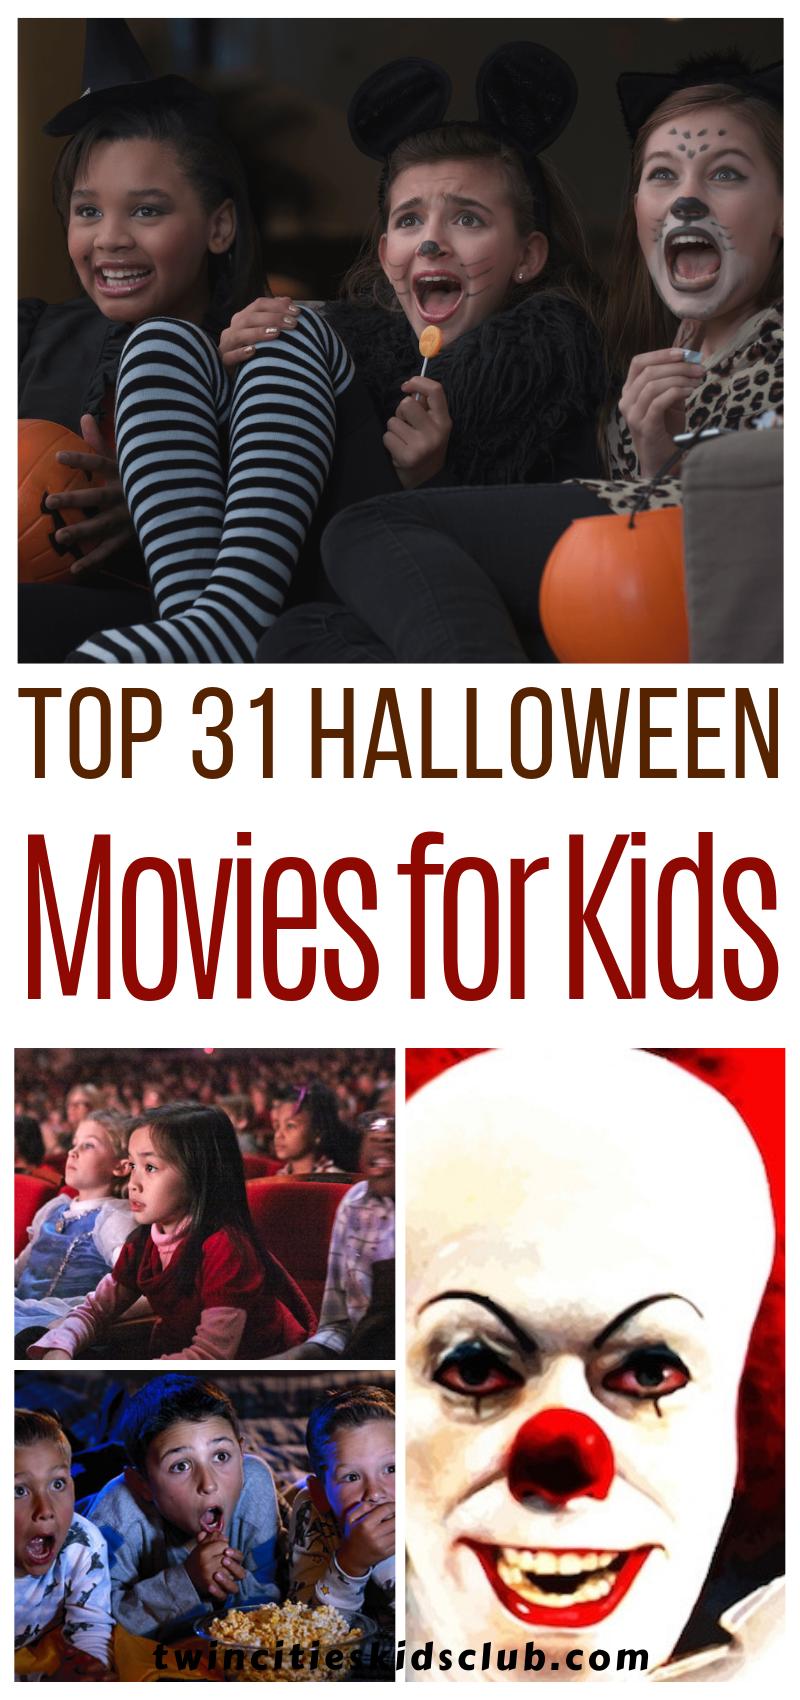 Top 31 Halloween Movies for Kids (2017) Kid movies